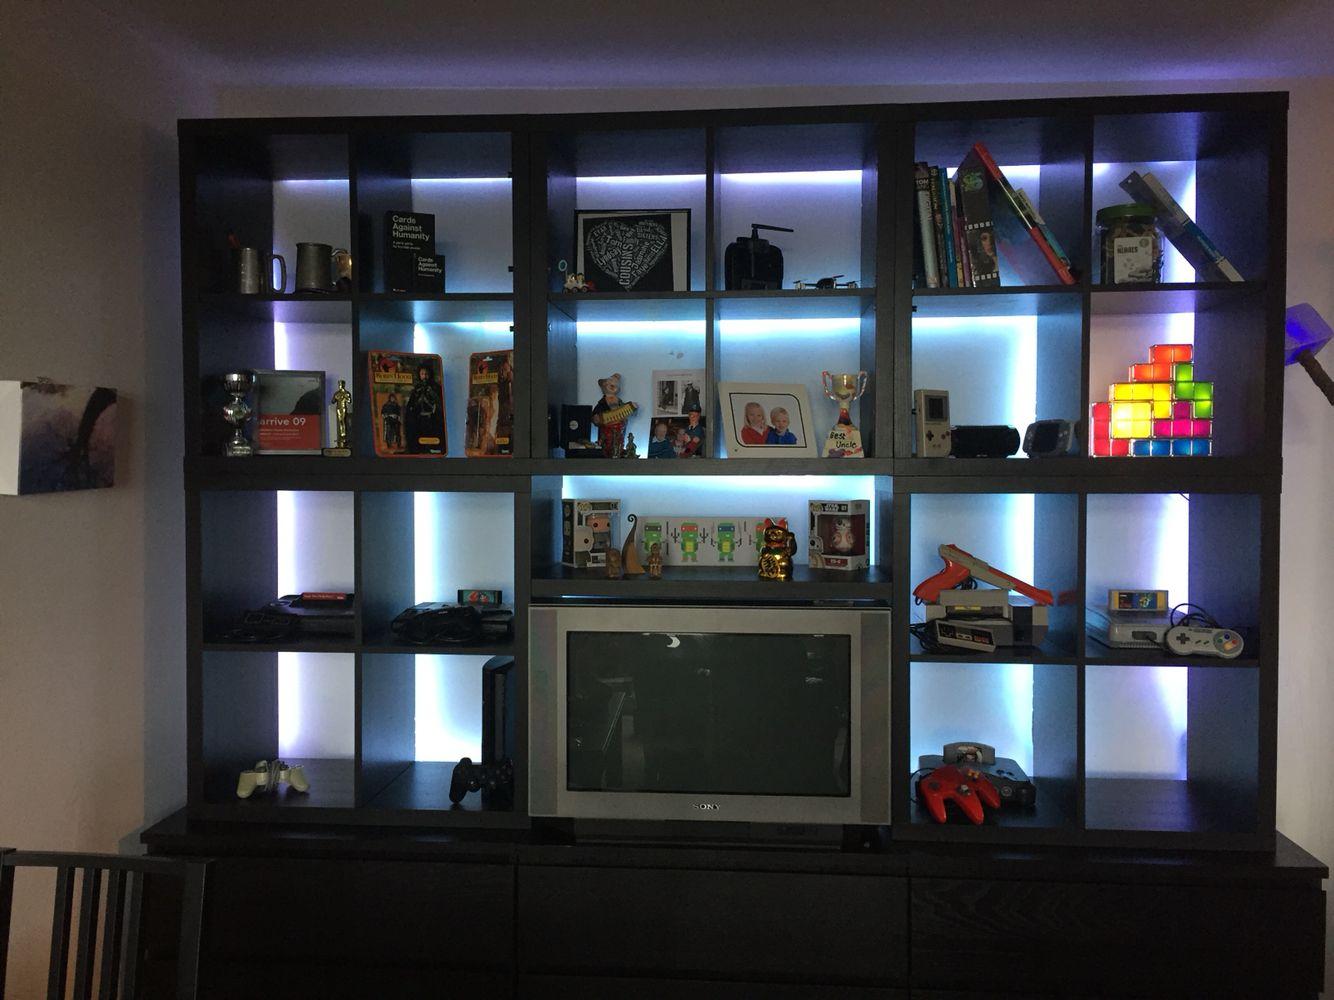 High Quality Nerd Shelf